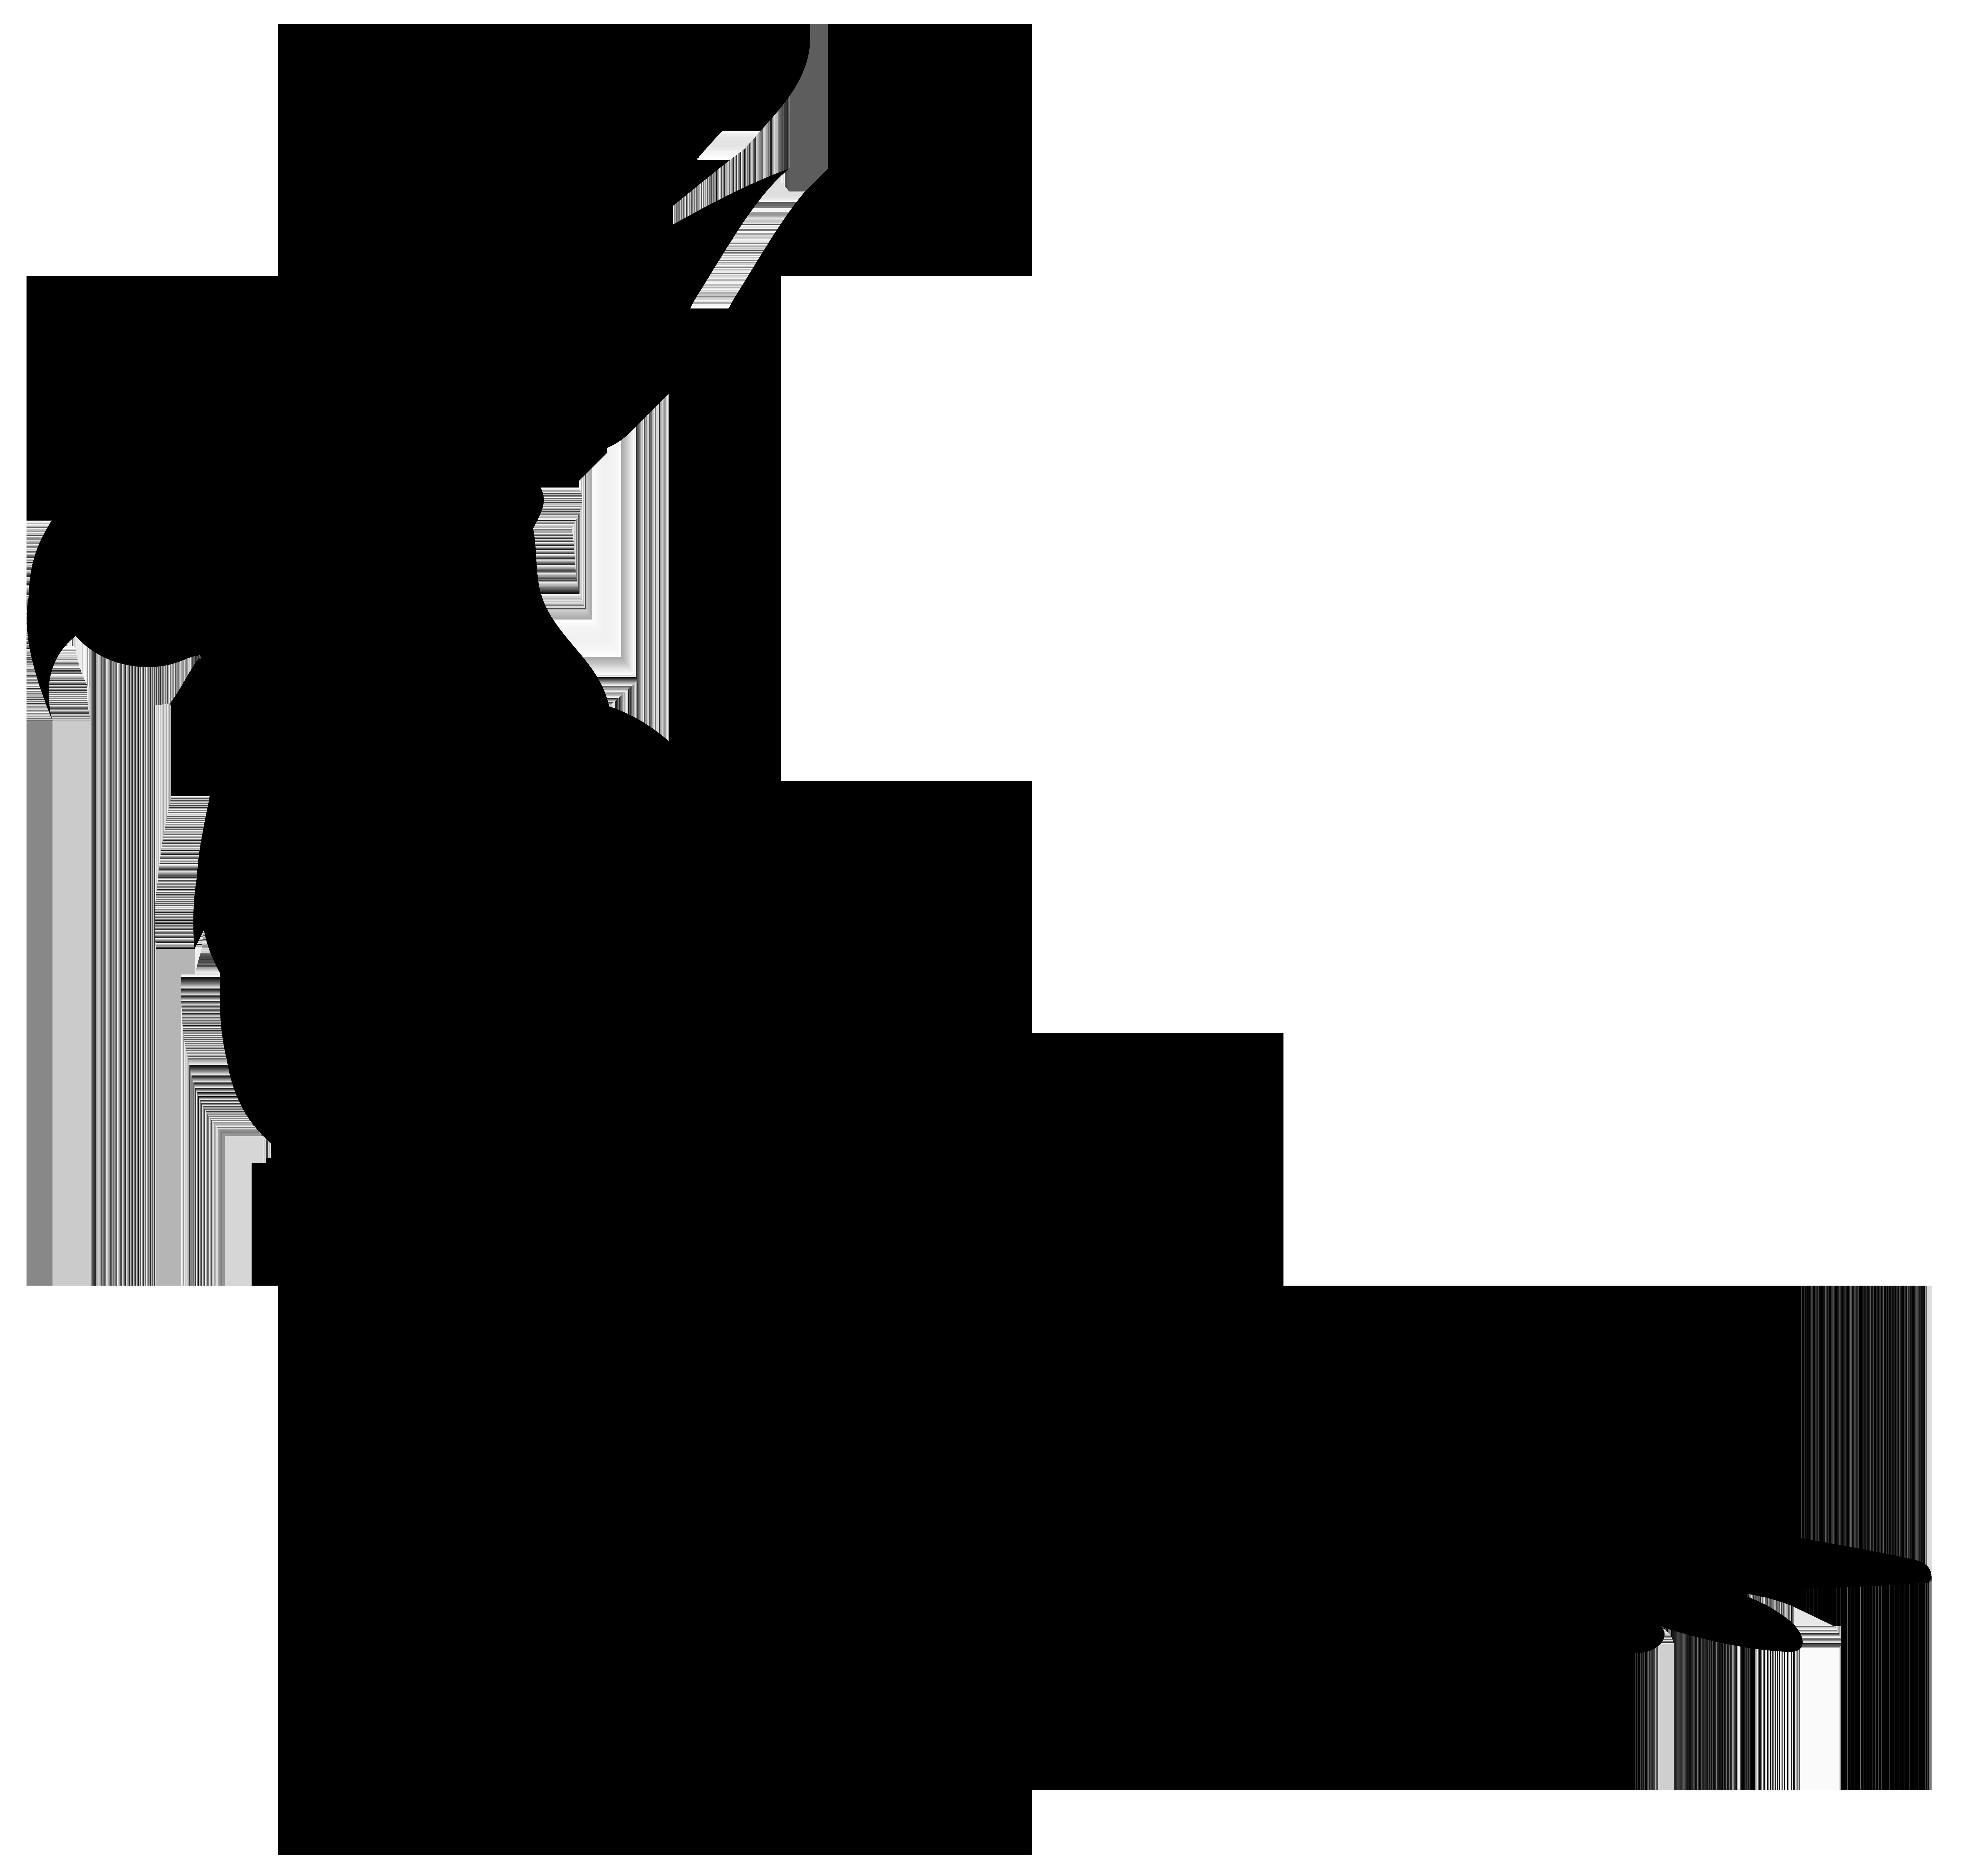 8000x7642 Parrot Silhouette Png Transparent Clip Art Imageu200b Gallery